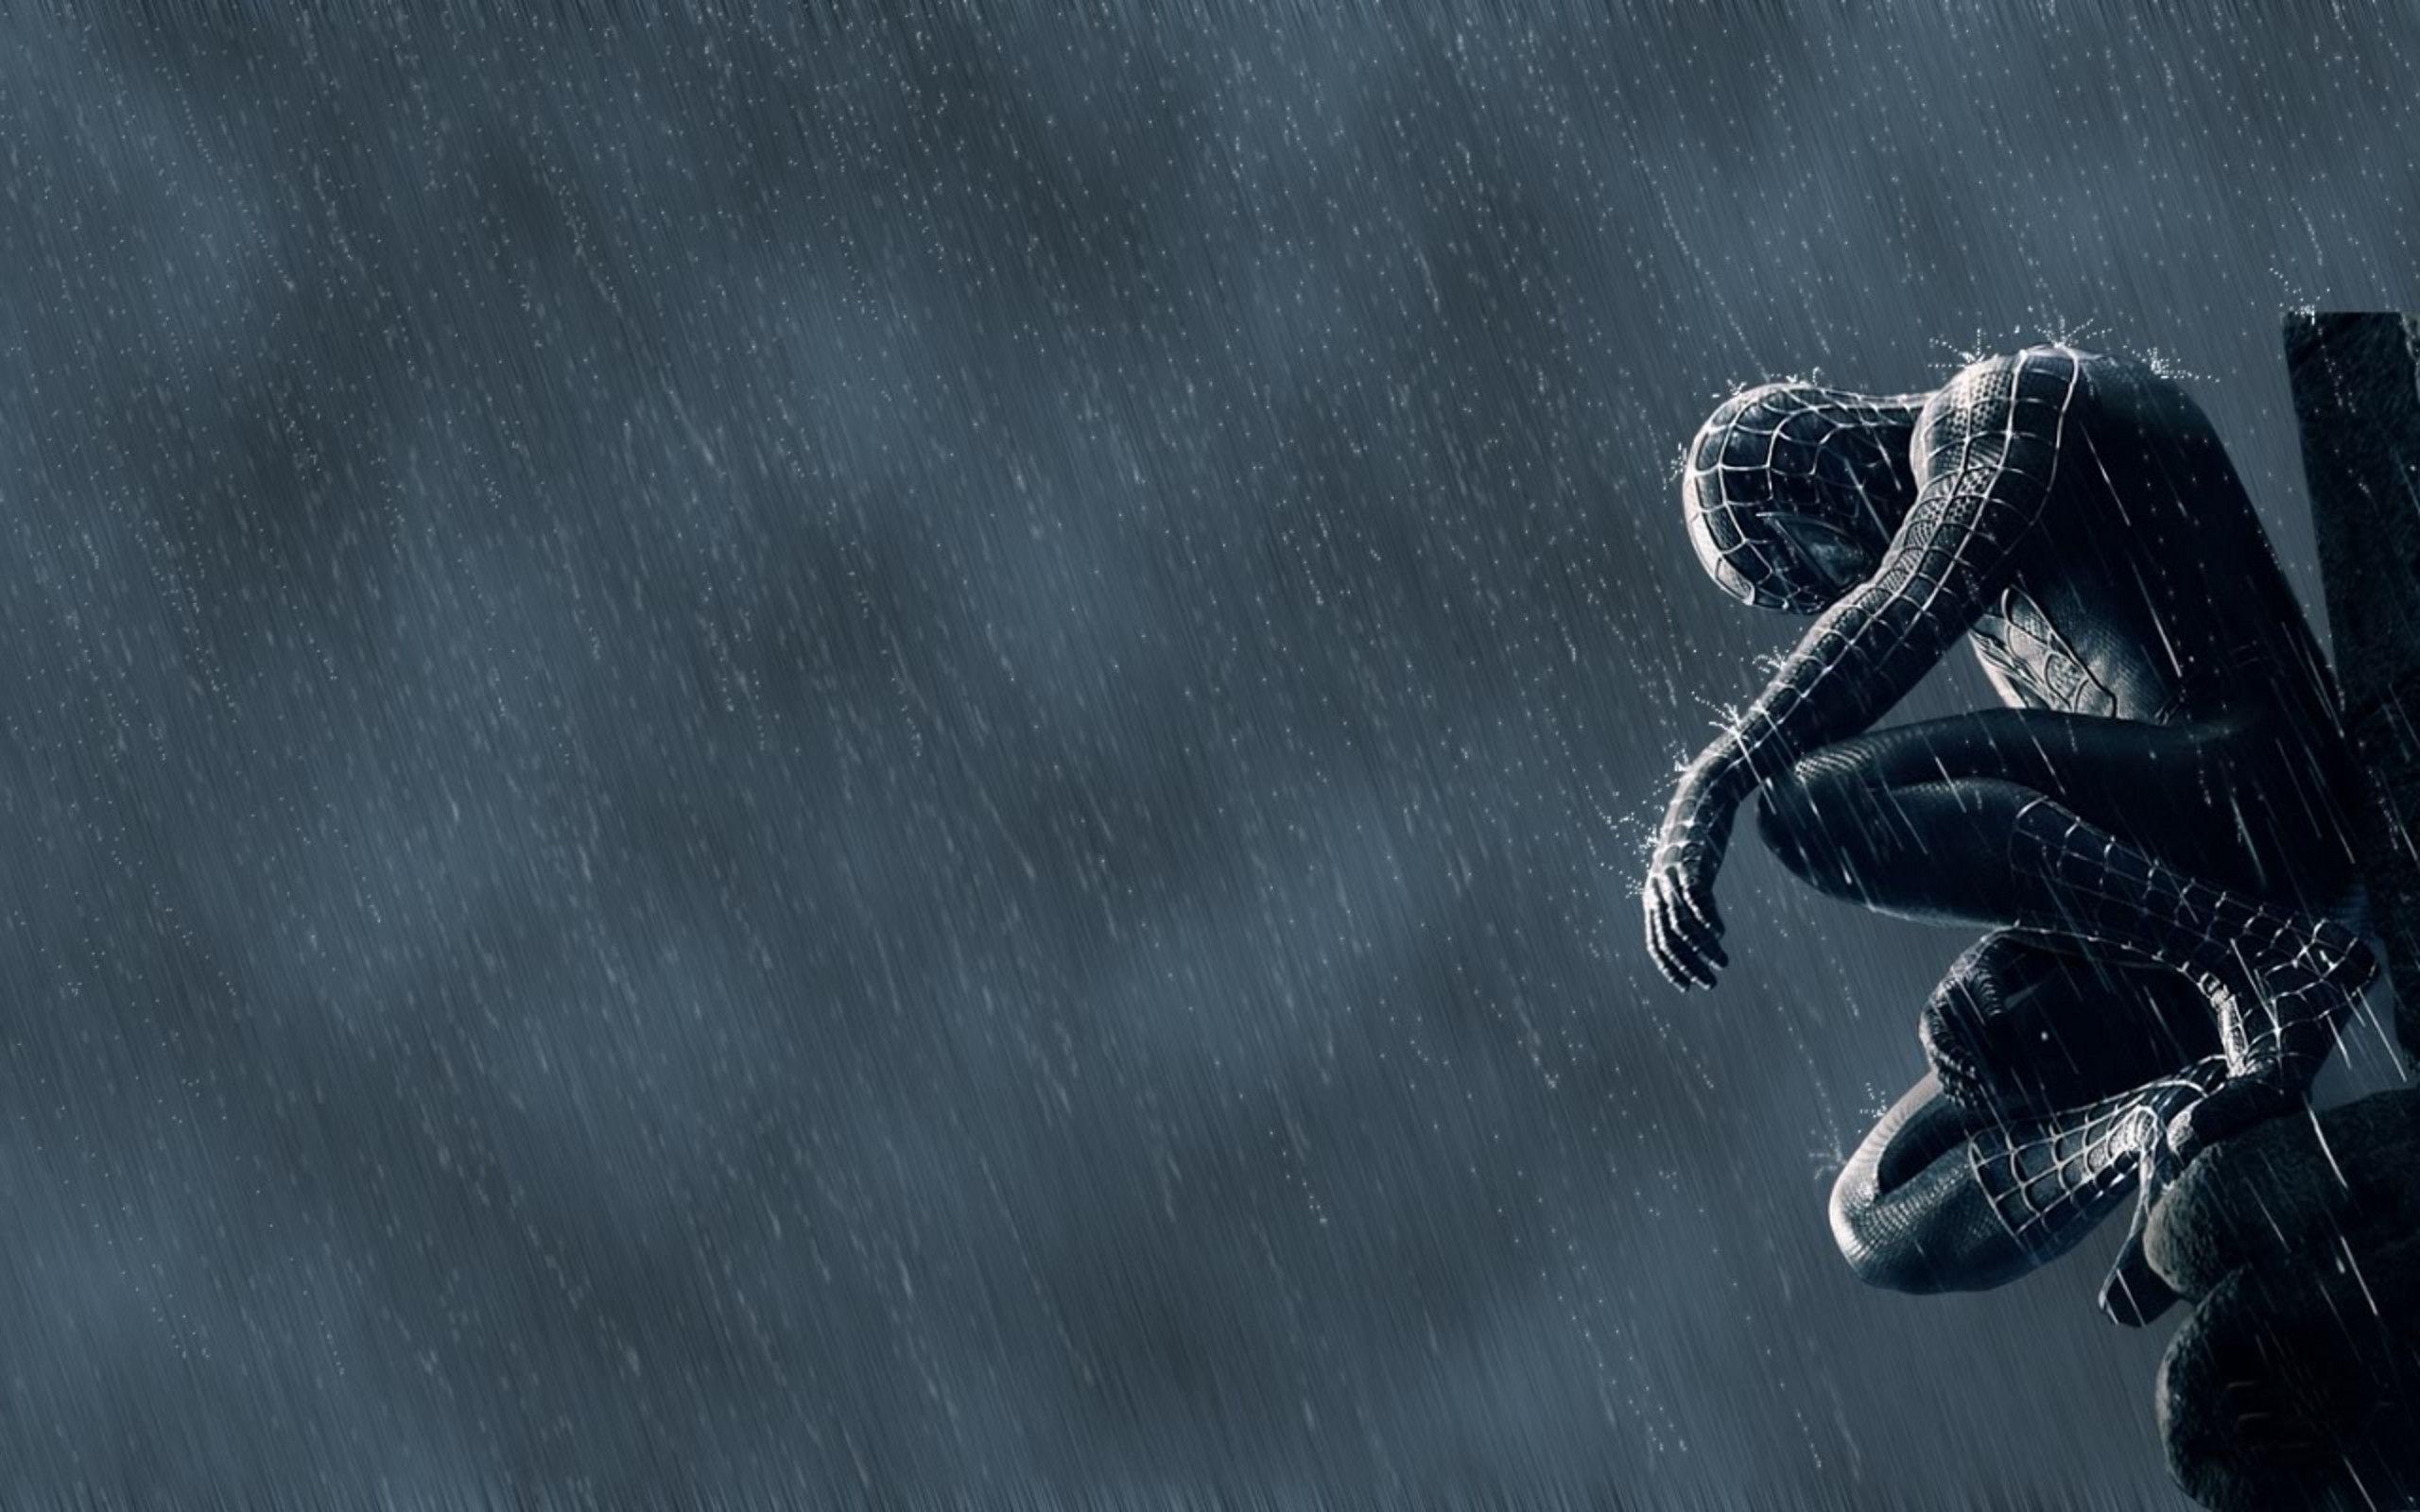 animated rain wallpapers 1366x768 - photo #28